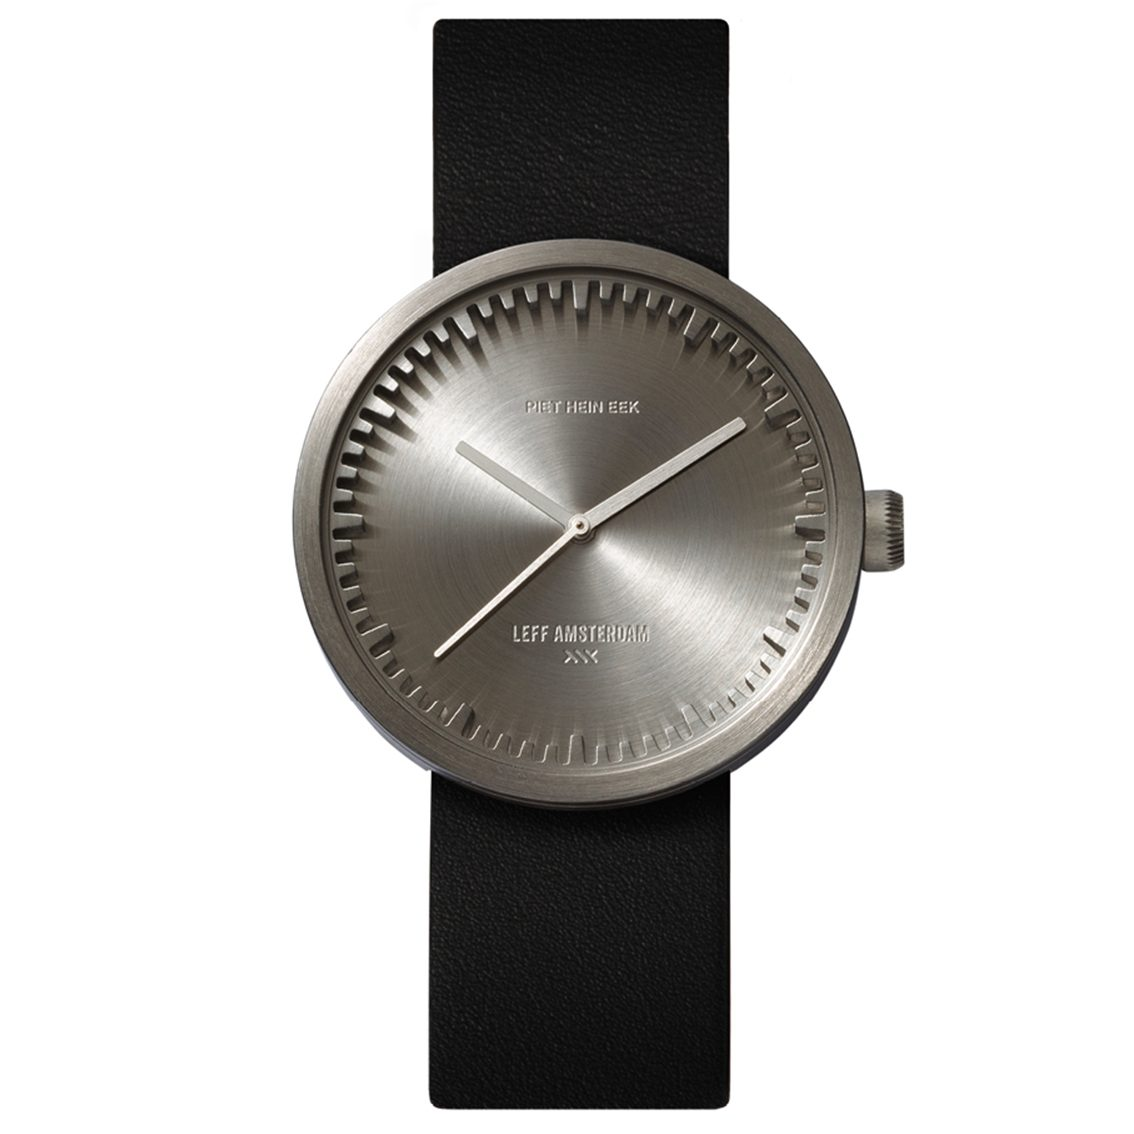 Tube Watch D38 Steel by Piet Hein Eek and Leff Amsterdamfrom Dezeen Watch Store